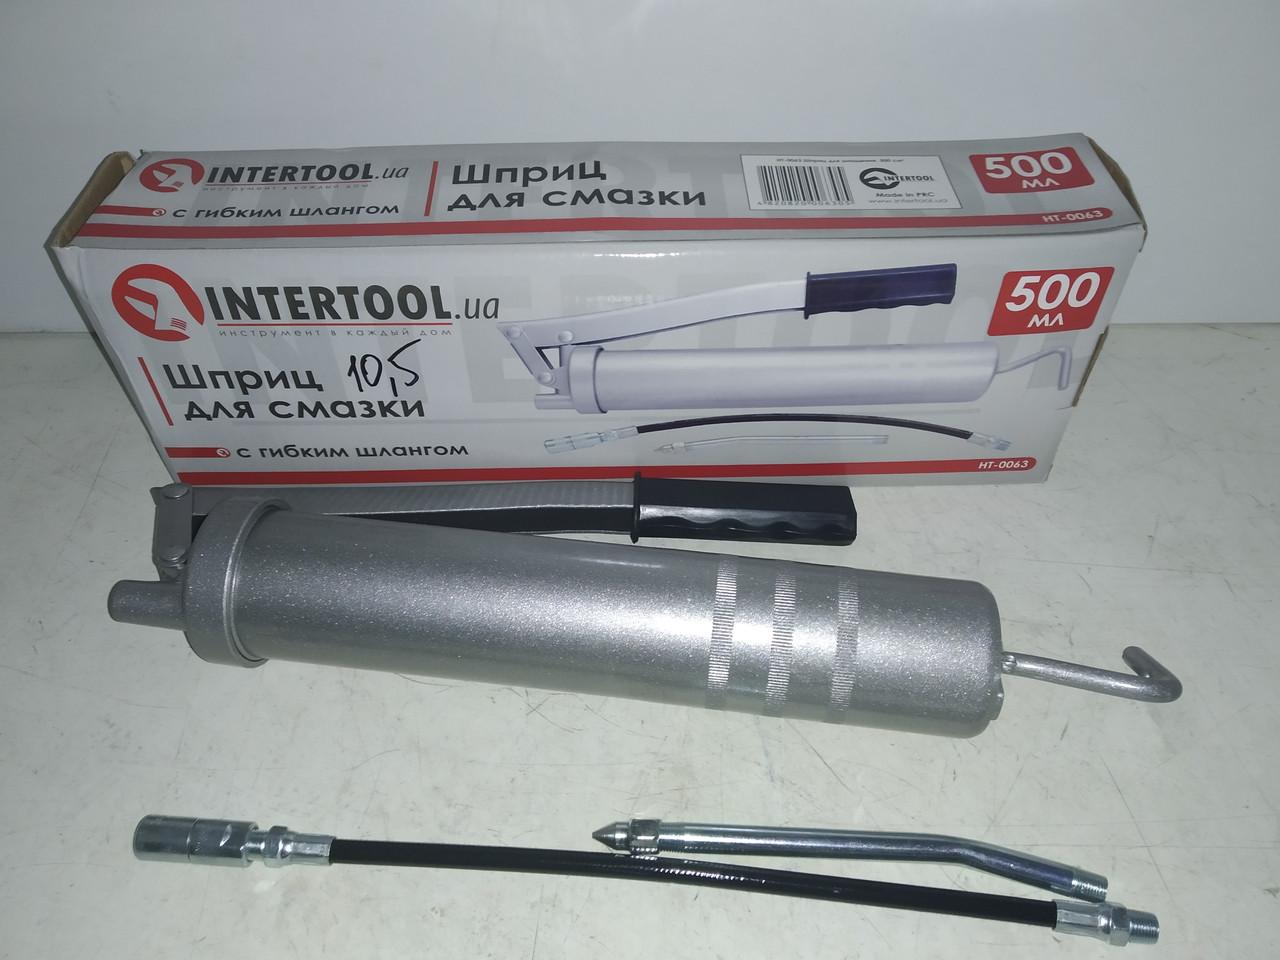 Шприц для смазки 500 мл с гибким шлангом Intertool